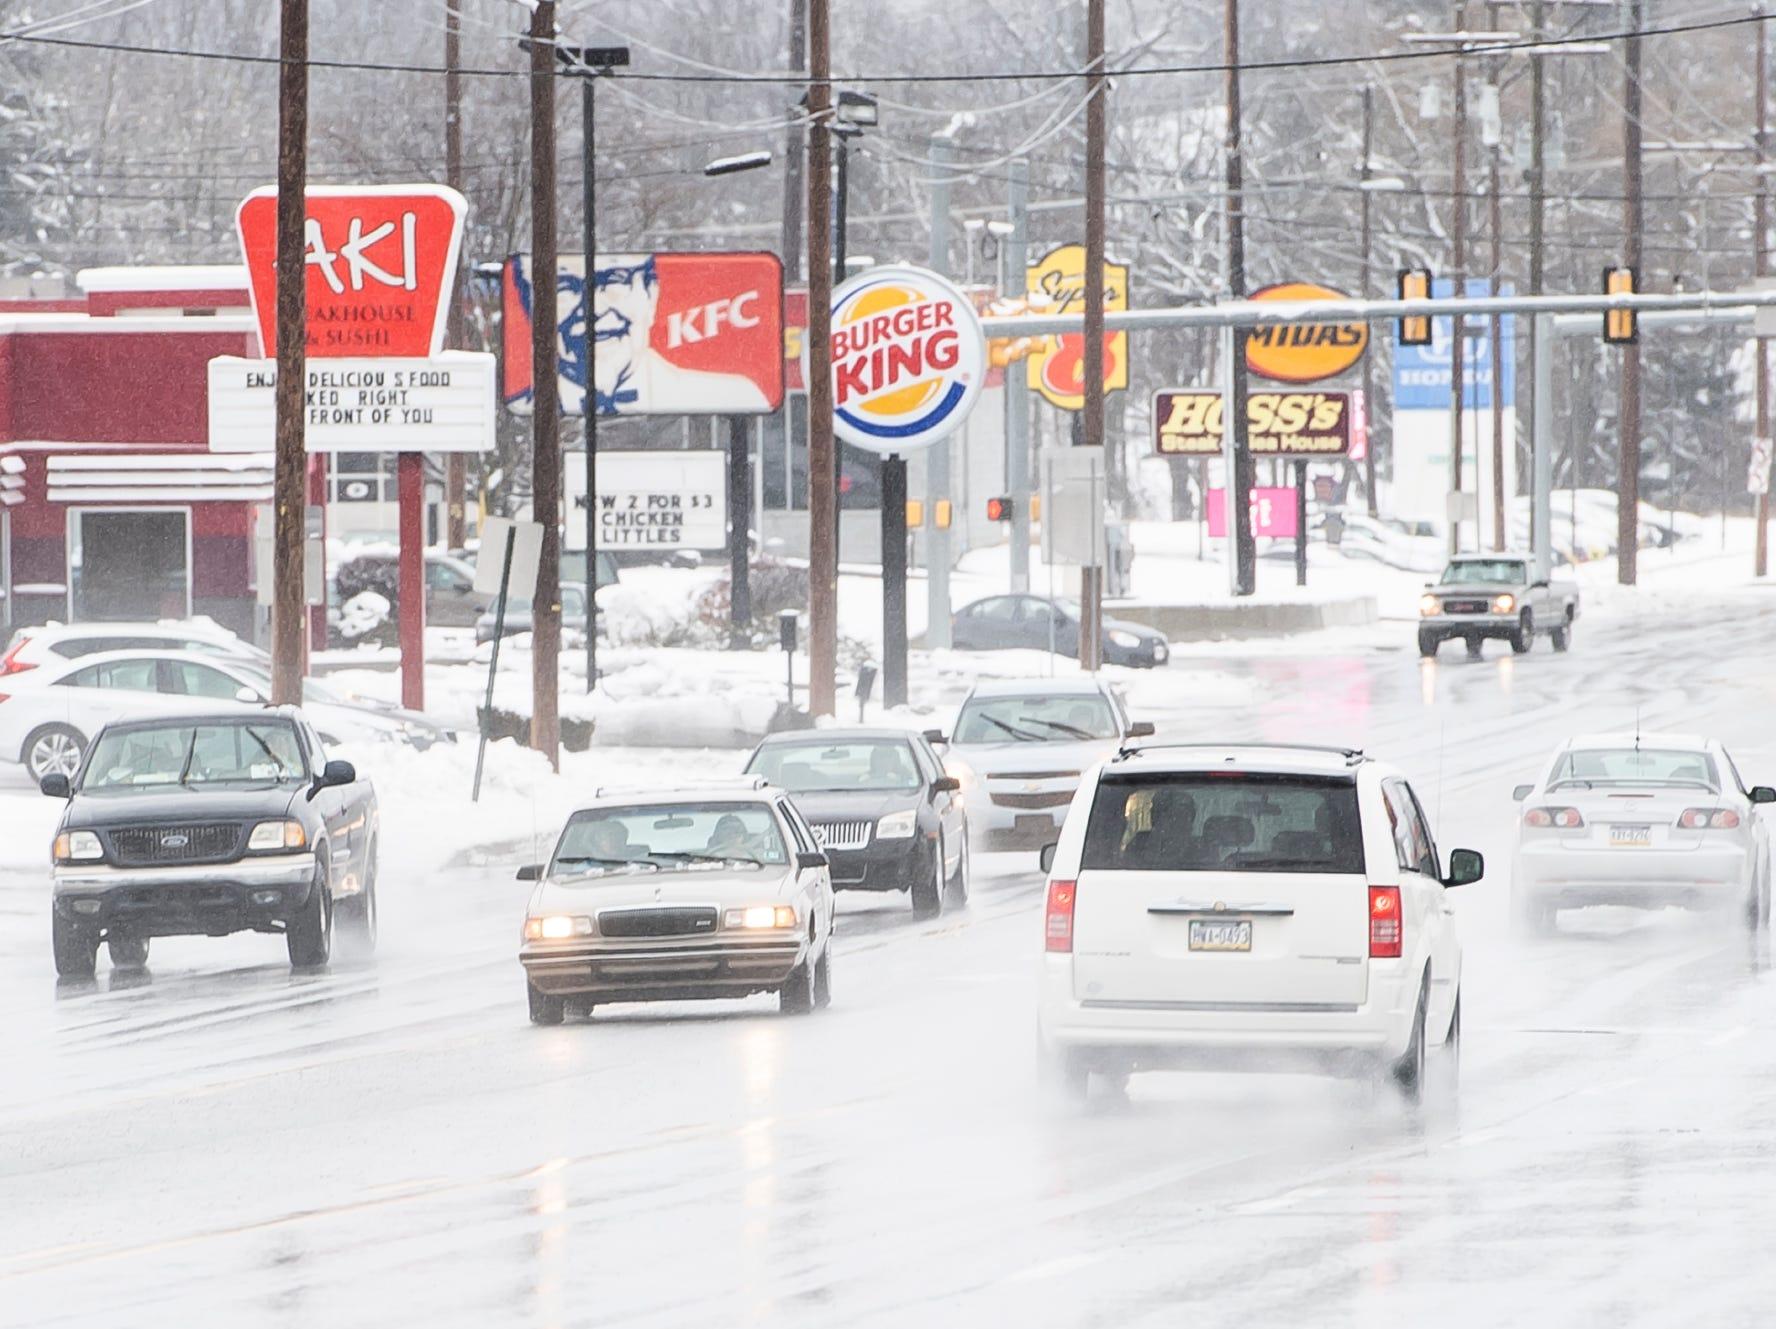 Motorists drive through a wintry mix of freezing rain on Carlisle Street in Hanover Borough Tuesday, February 12, 2019.